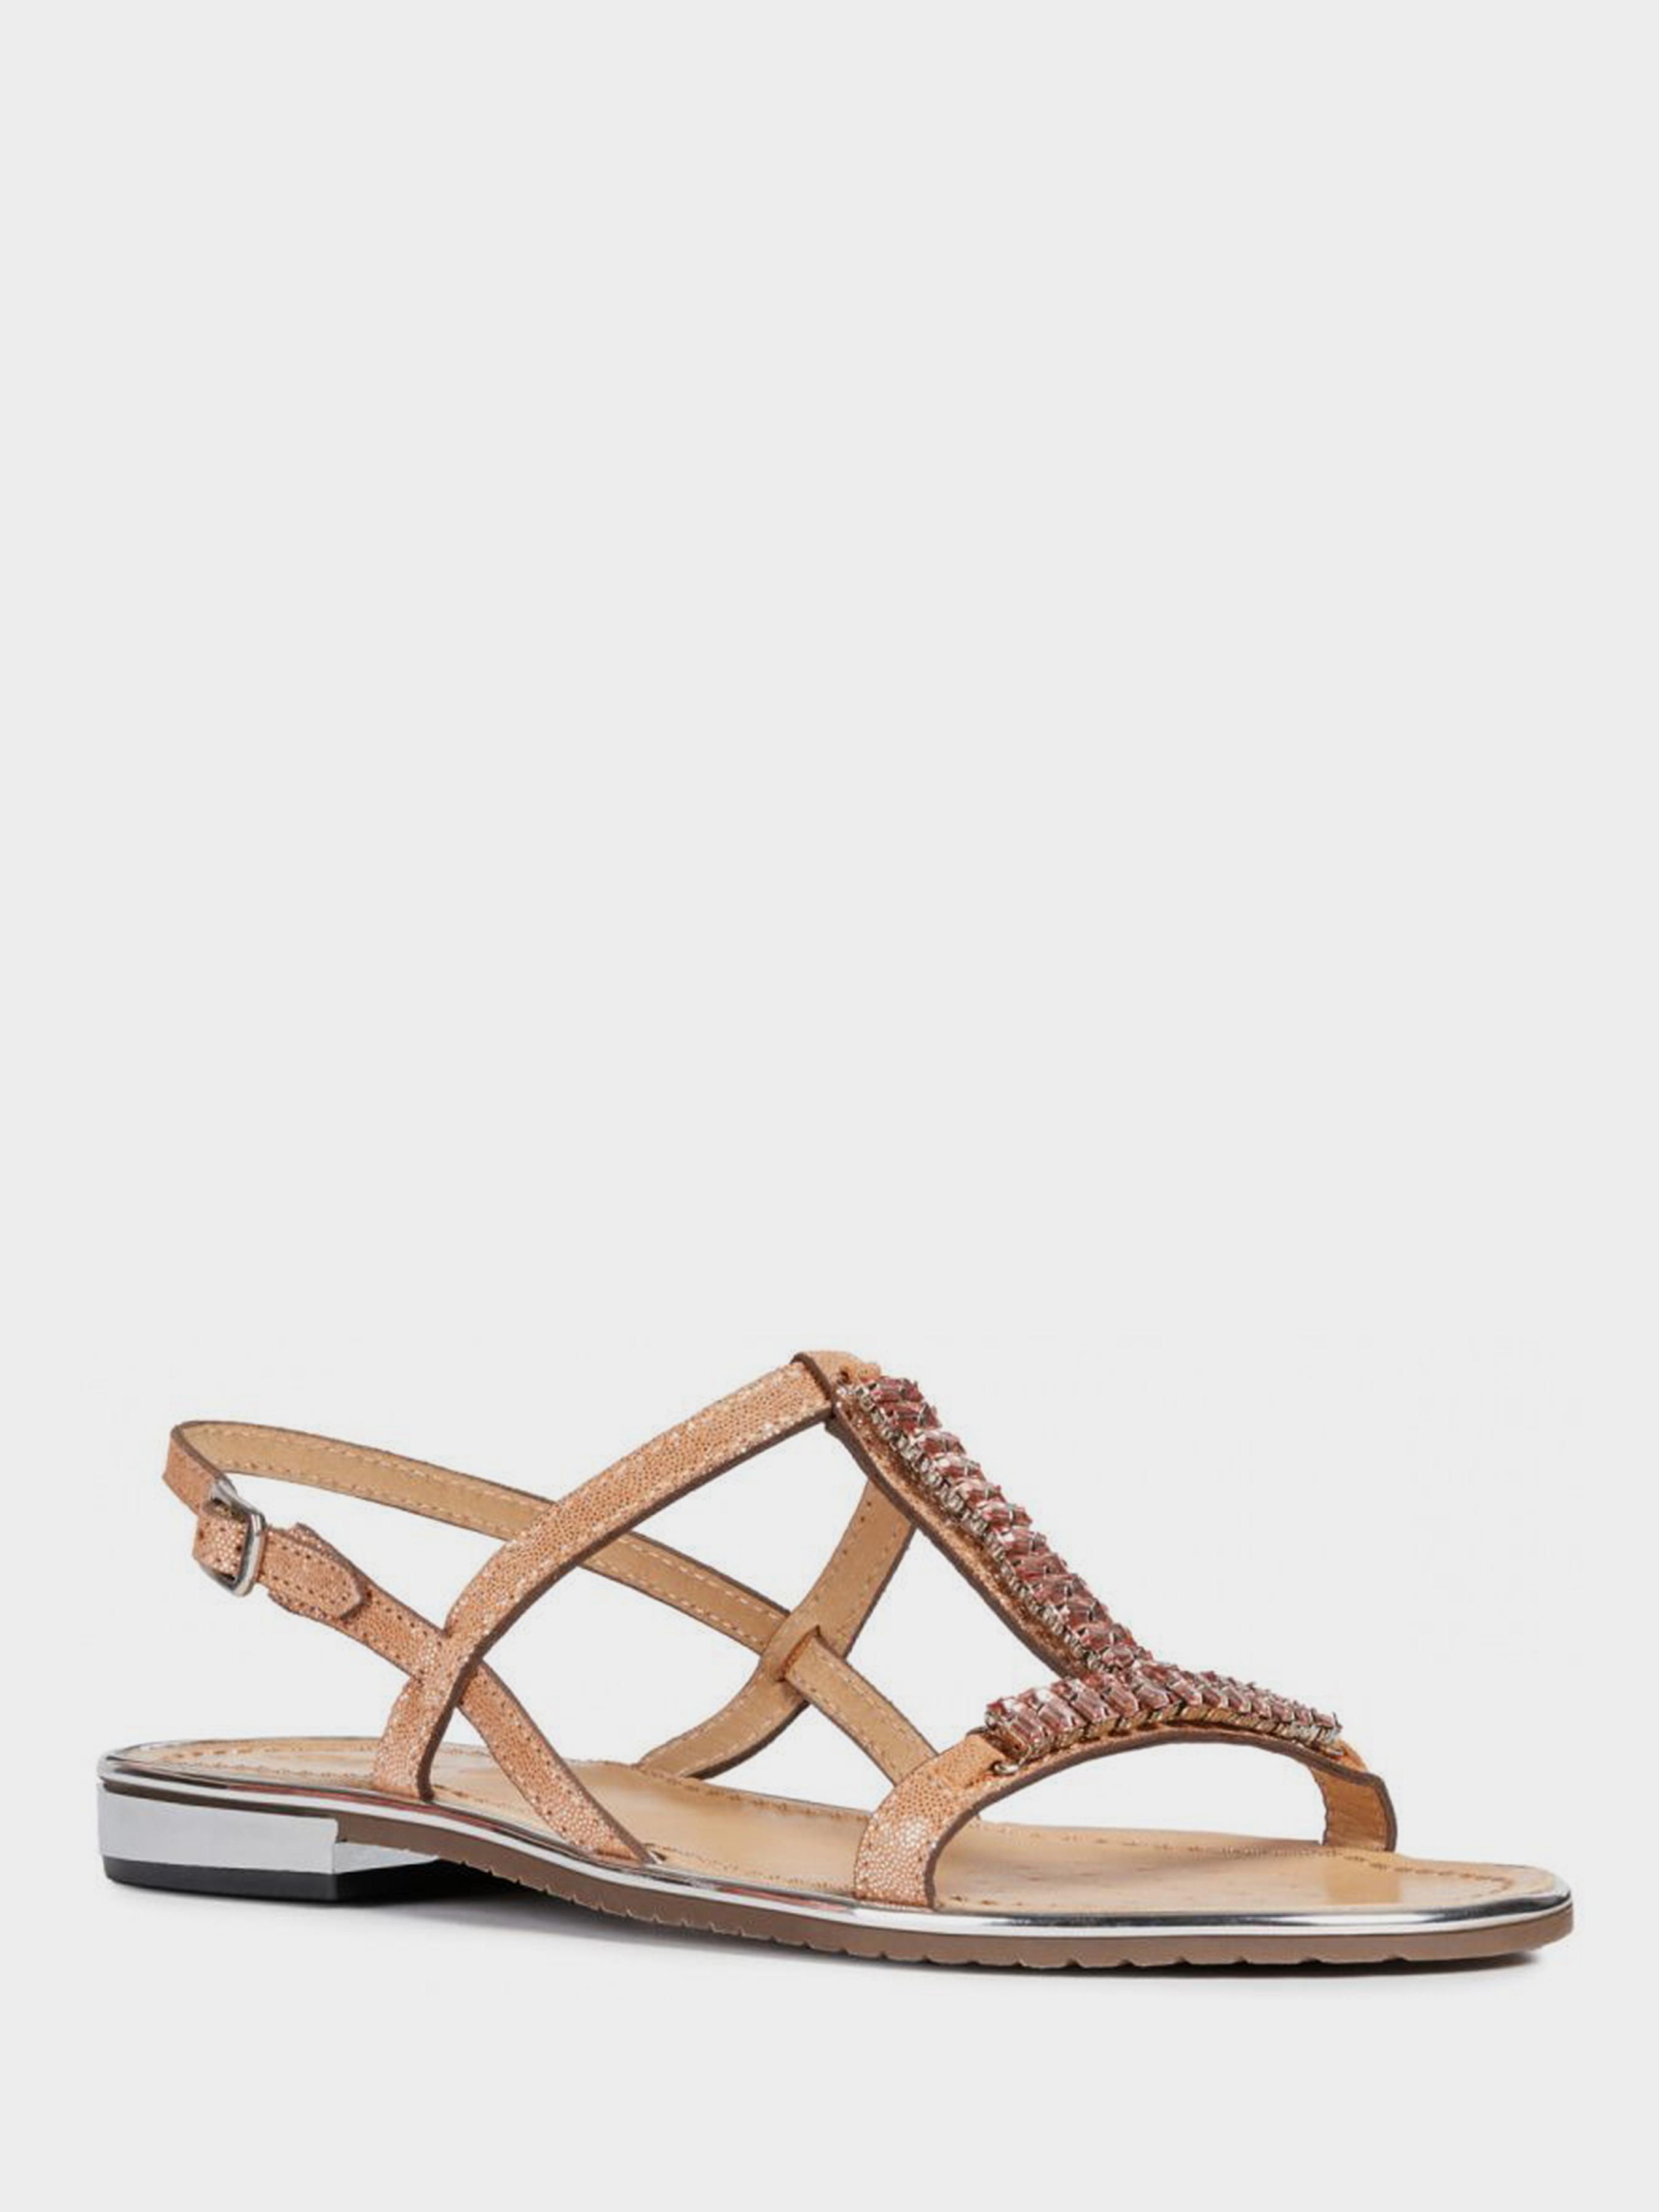 Сандалии женские Geox D SOZY PLUS XW3593 брендовая обувь, 2017